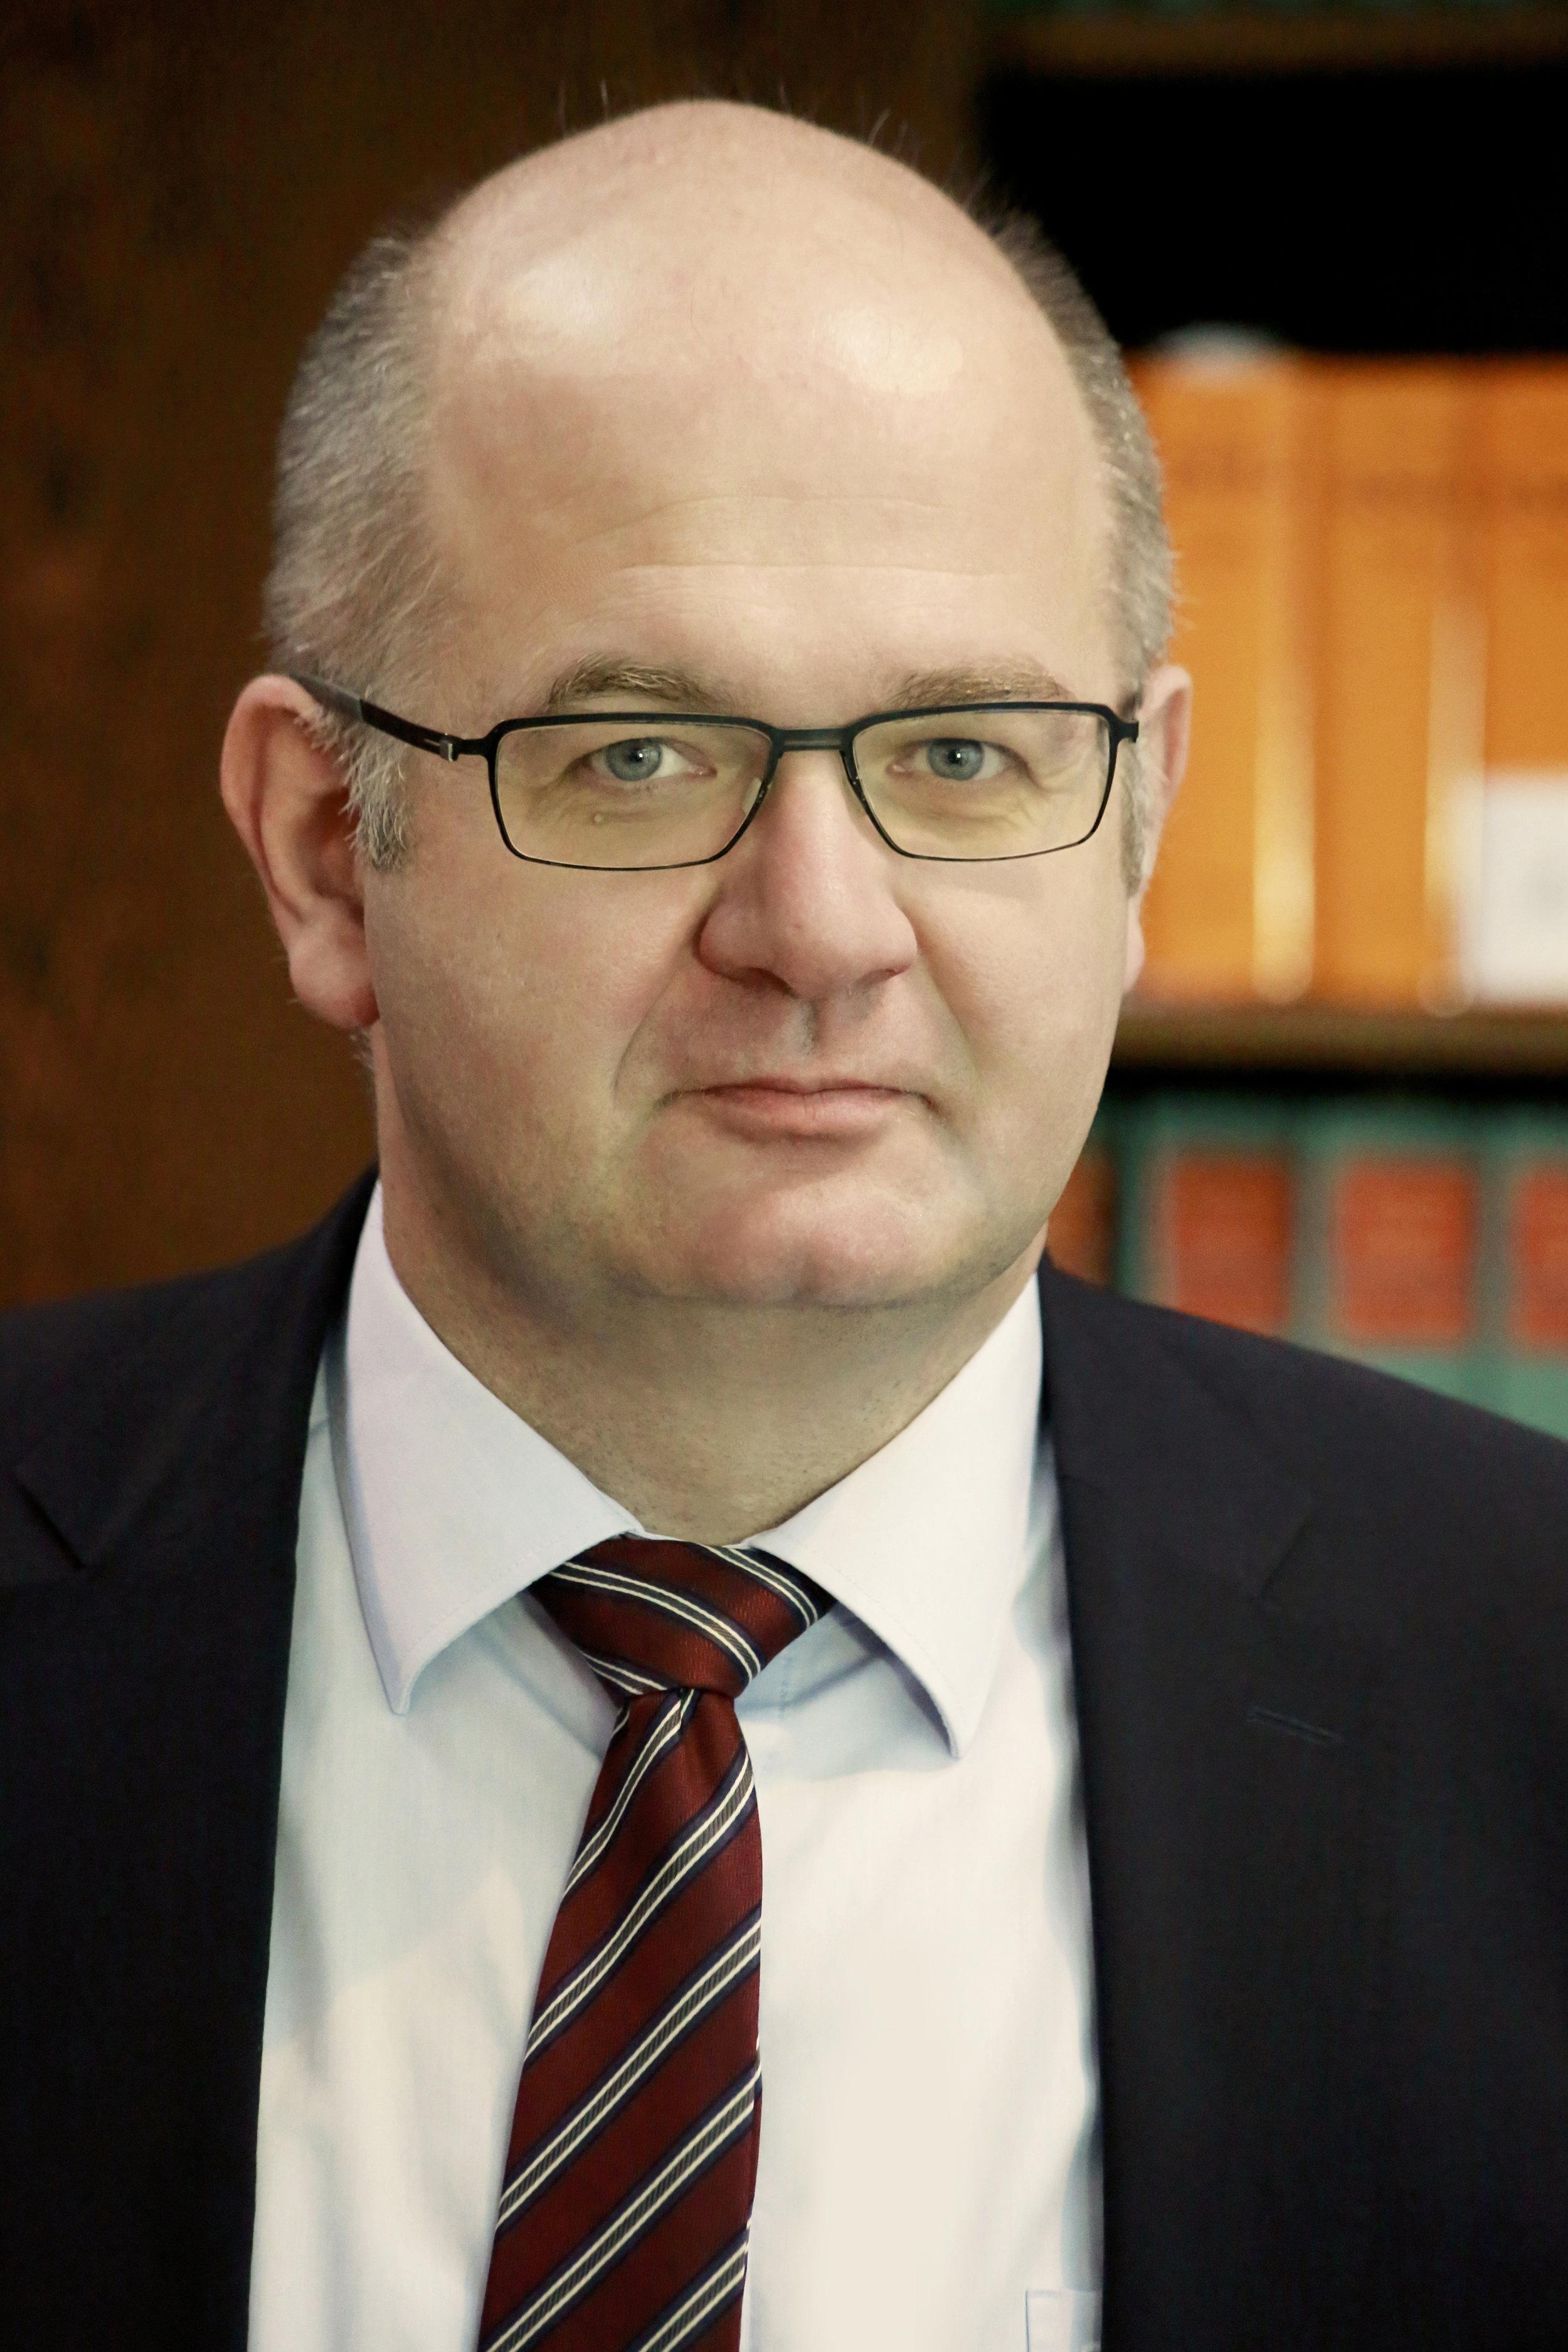 Dr. Jochen Heide